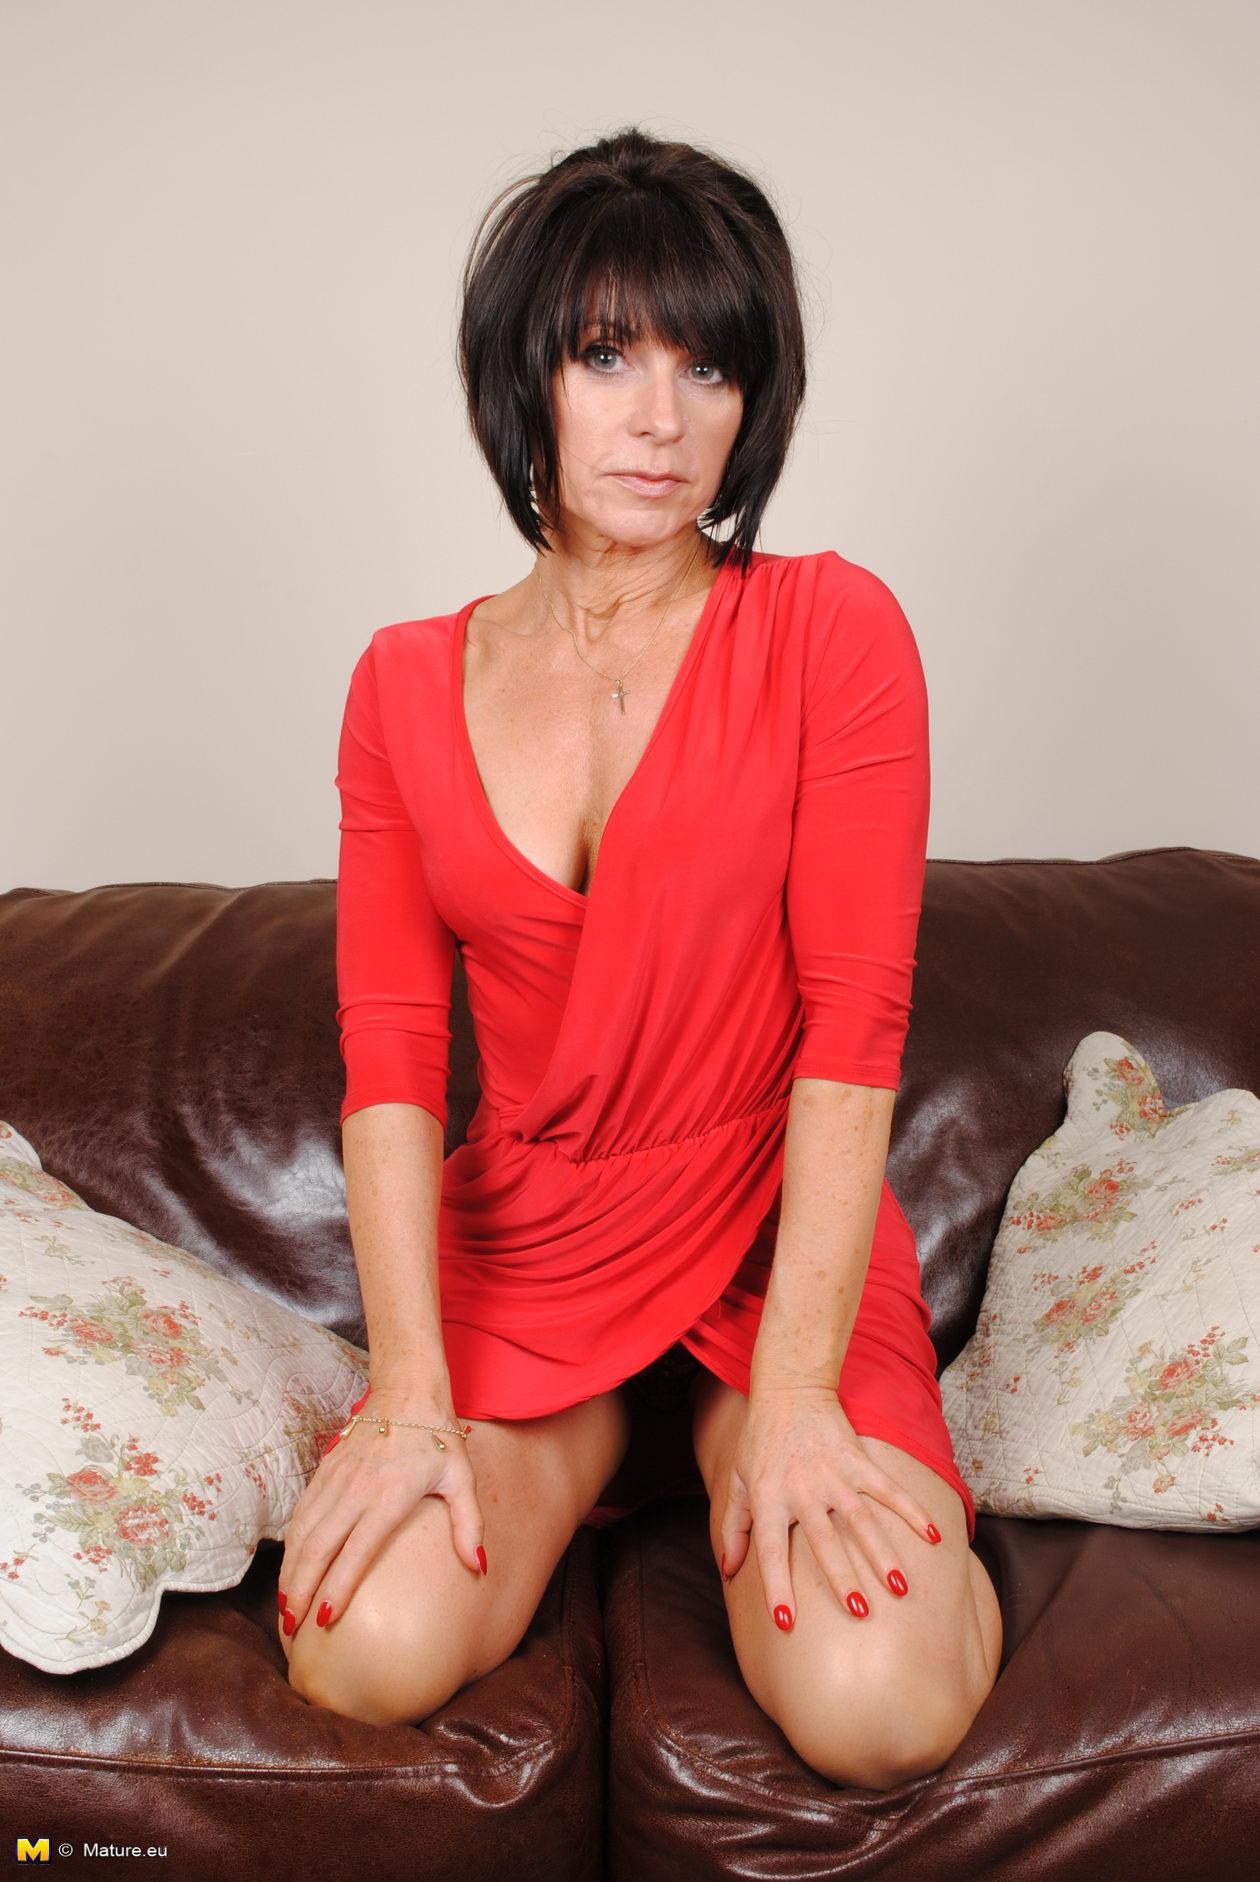 Lily lovette porn star